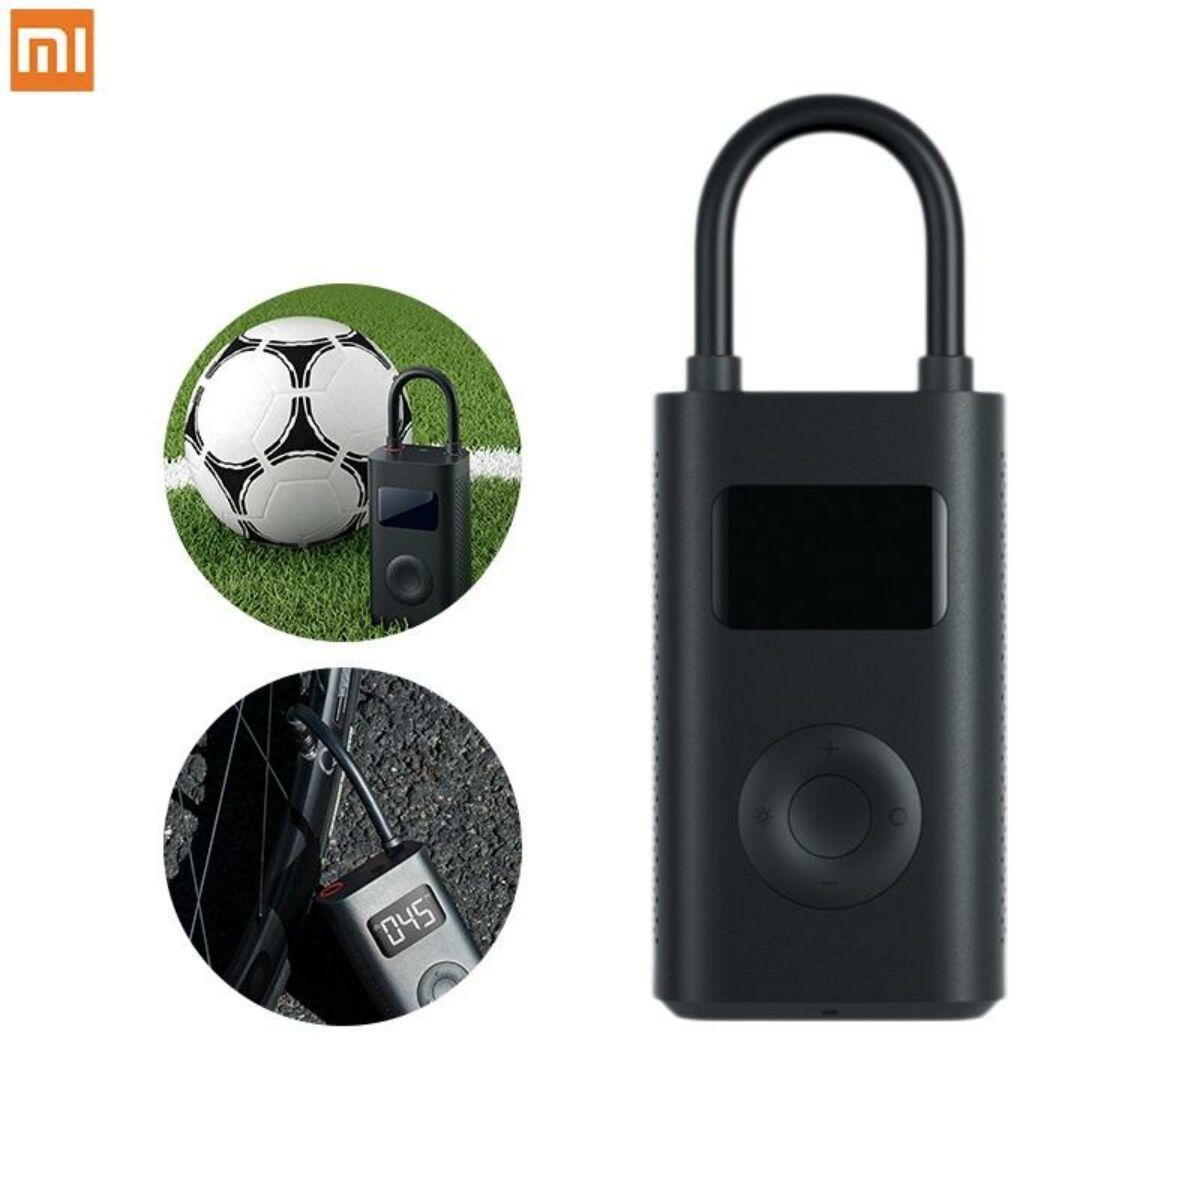 Xiaomi Mi Portable Electric Air Compressor, hordozható légkompresszor, fekete, EU, DZN4006GL